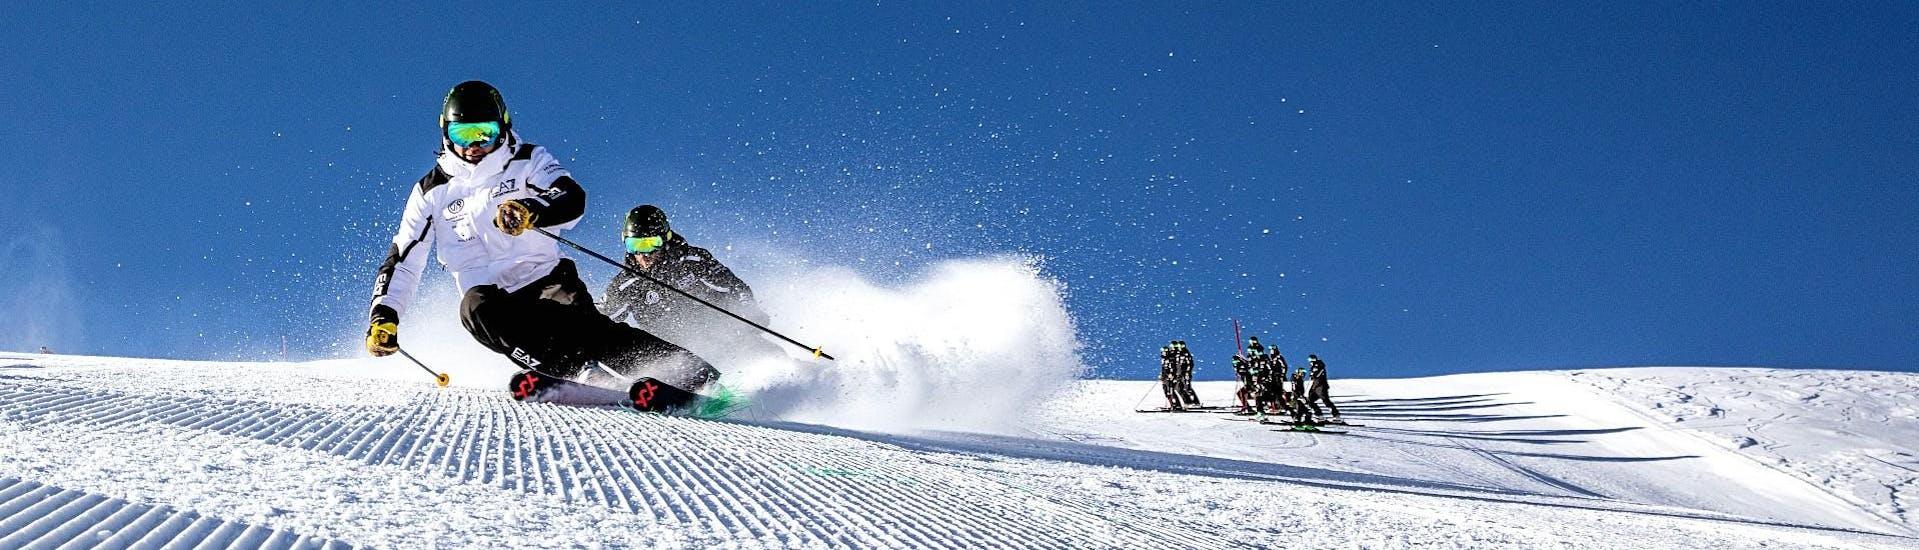 ski-lessons-for-teensadults-for-advanced-skiers-weekend-giorgio-rocca-ski-academy-stmoritz-hero